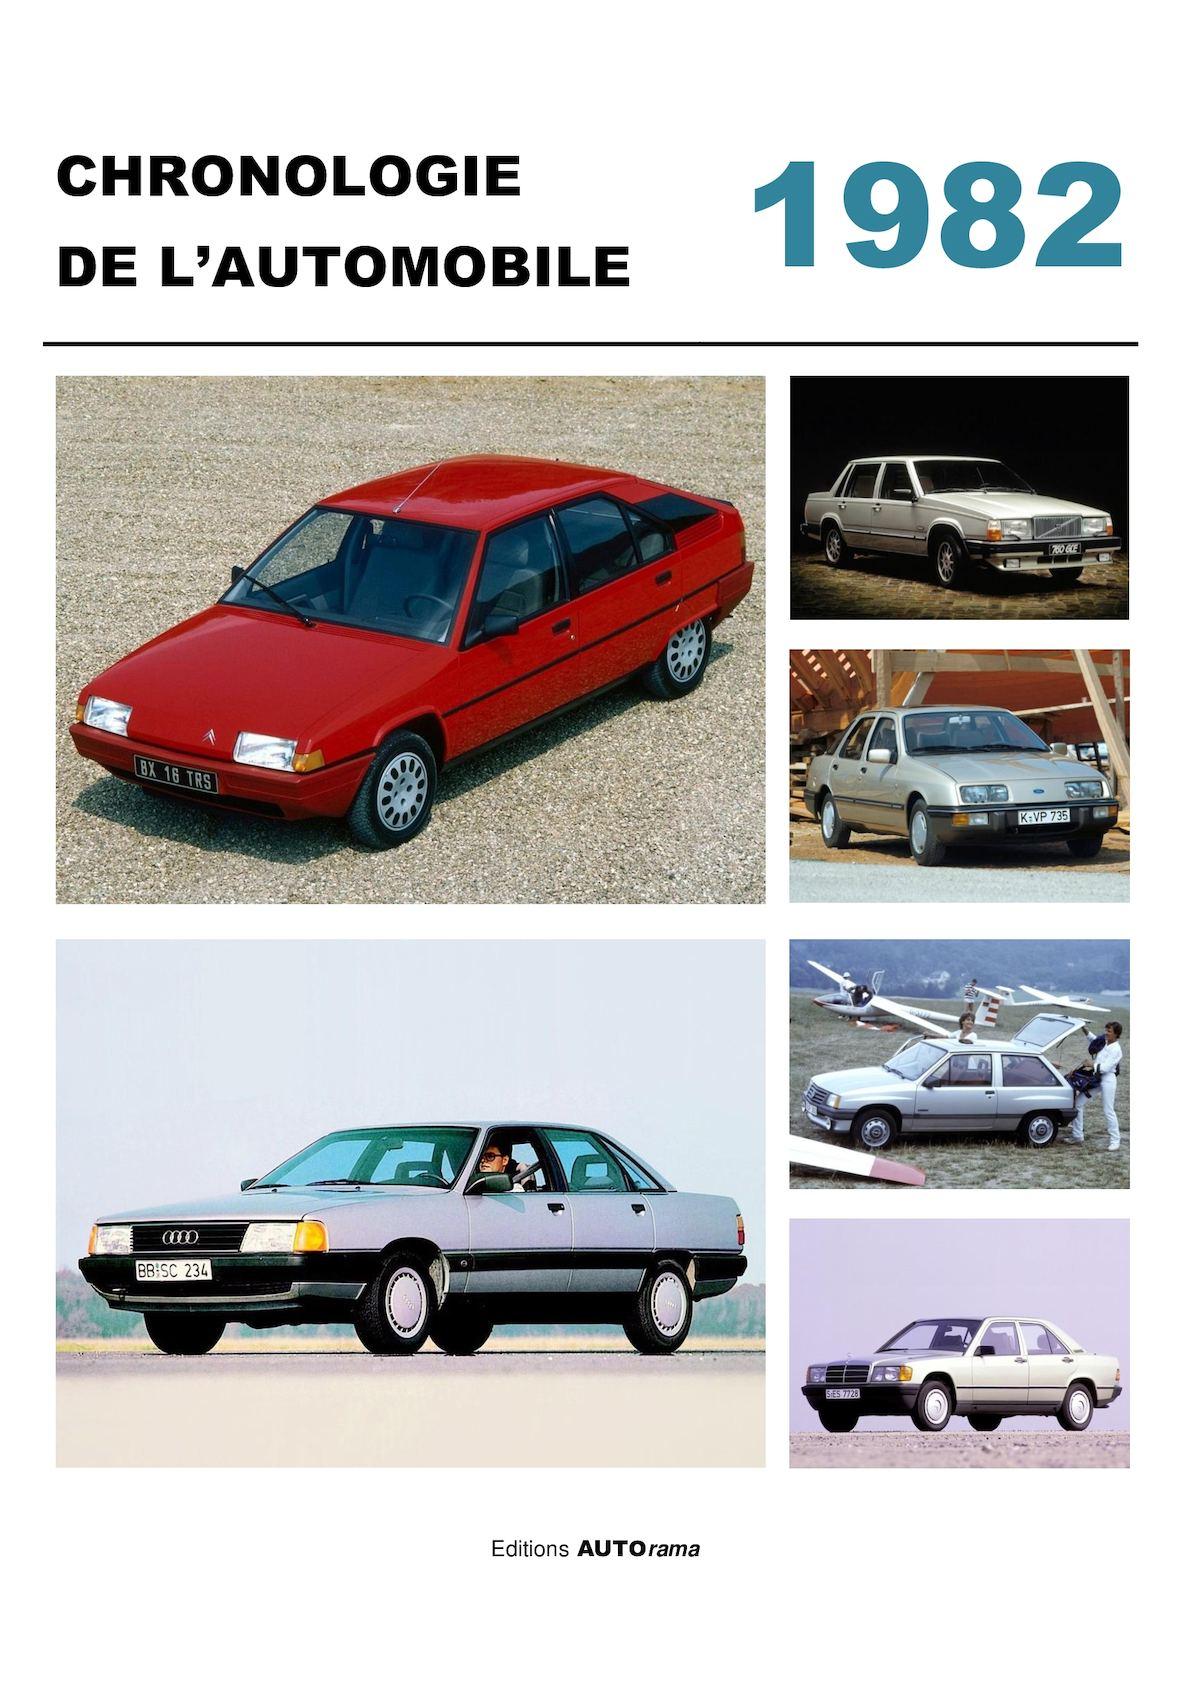 calam o chronologie de l 39 automobile 1982. Black Bedroom Furniture Sets. Home Design Ideas